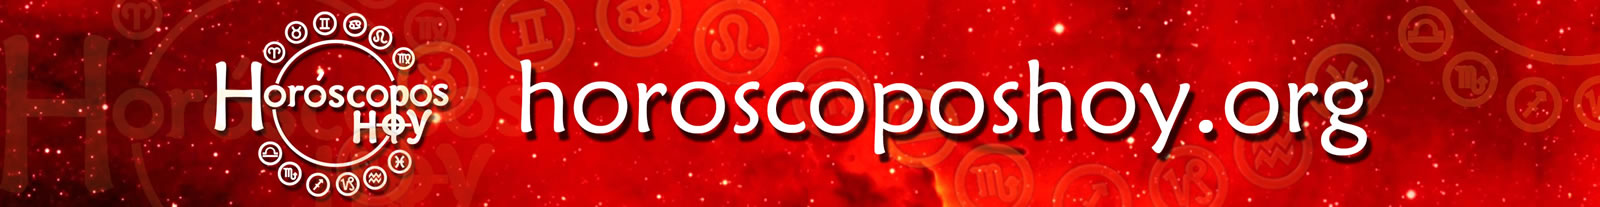 horoscopo predicciones diarias: